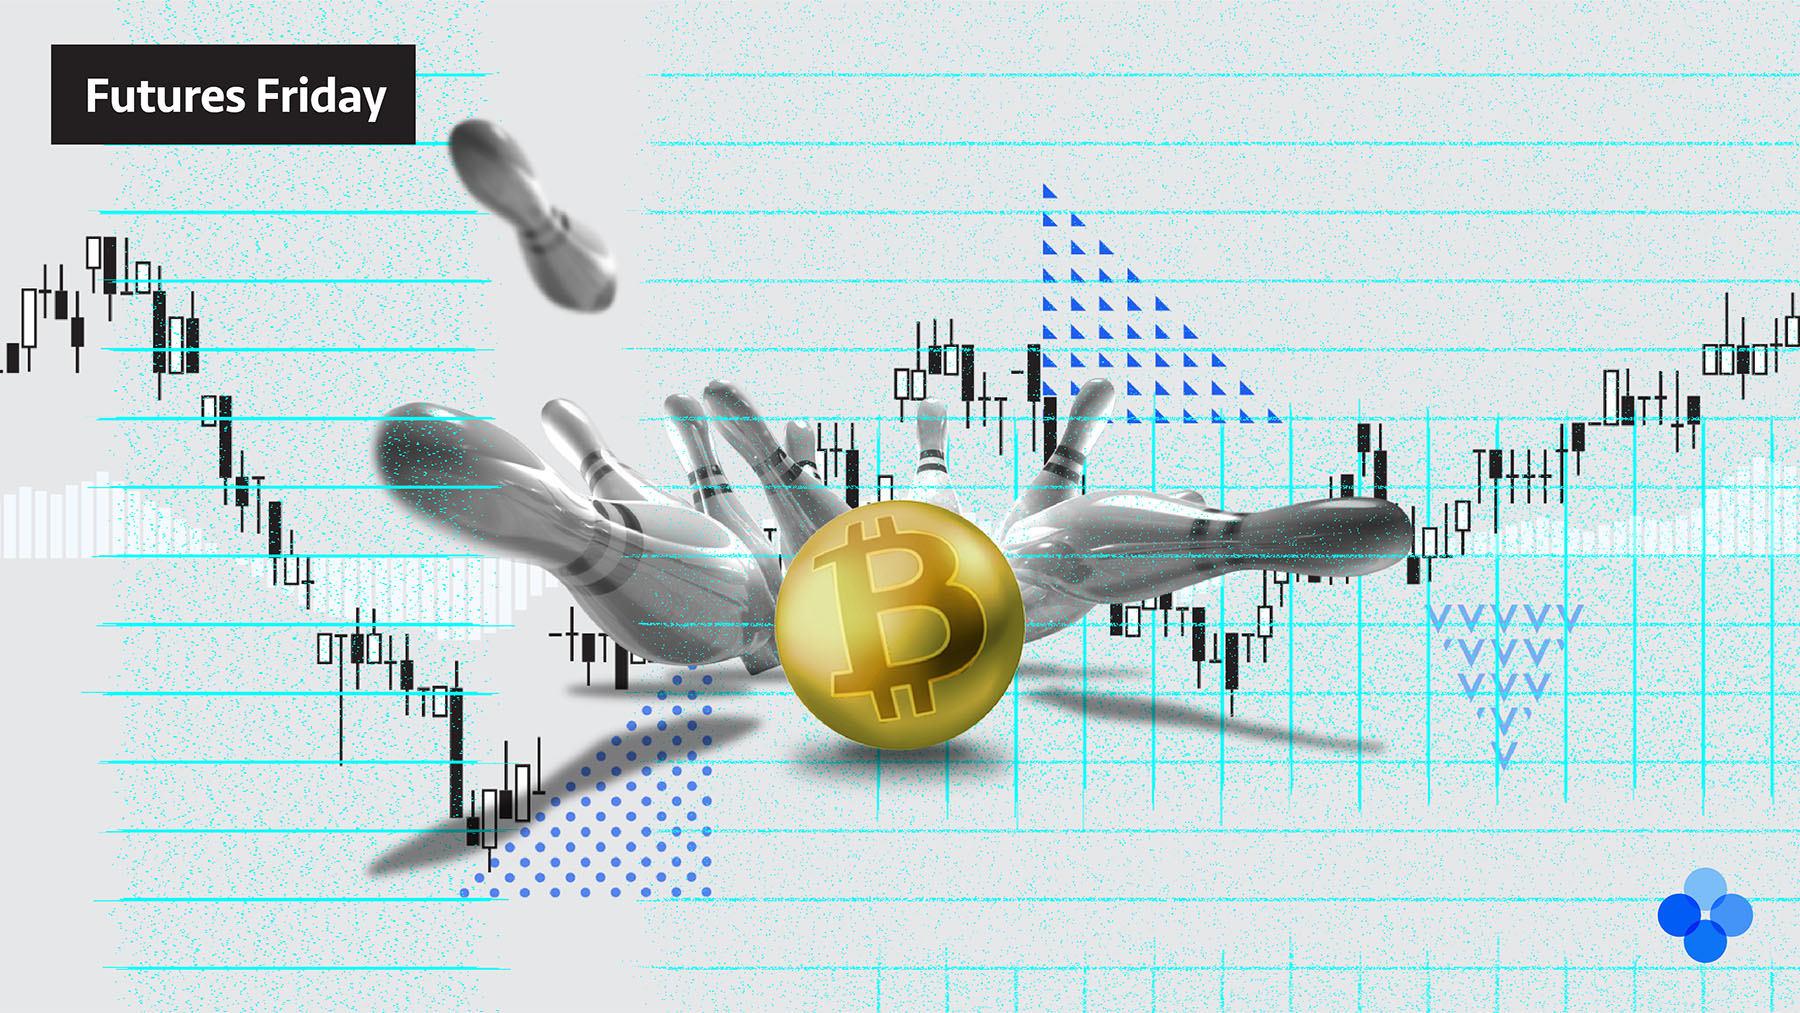 cryptocurrency investīcijas 2021 kas padara forex tirgotājs nelaimīgs?